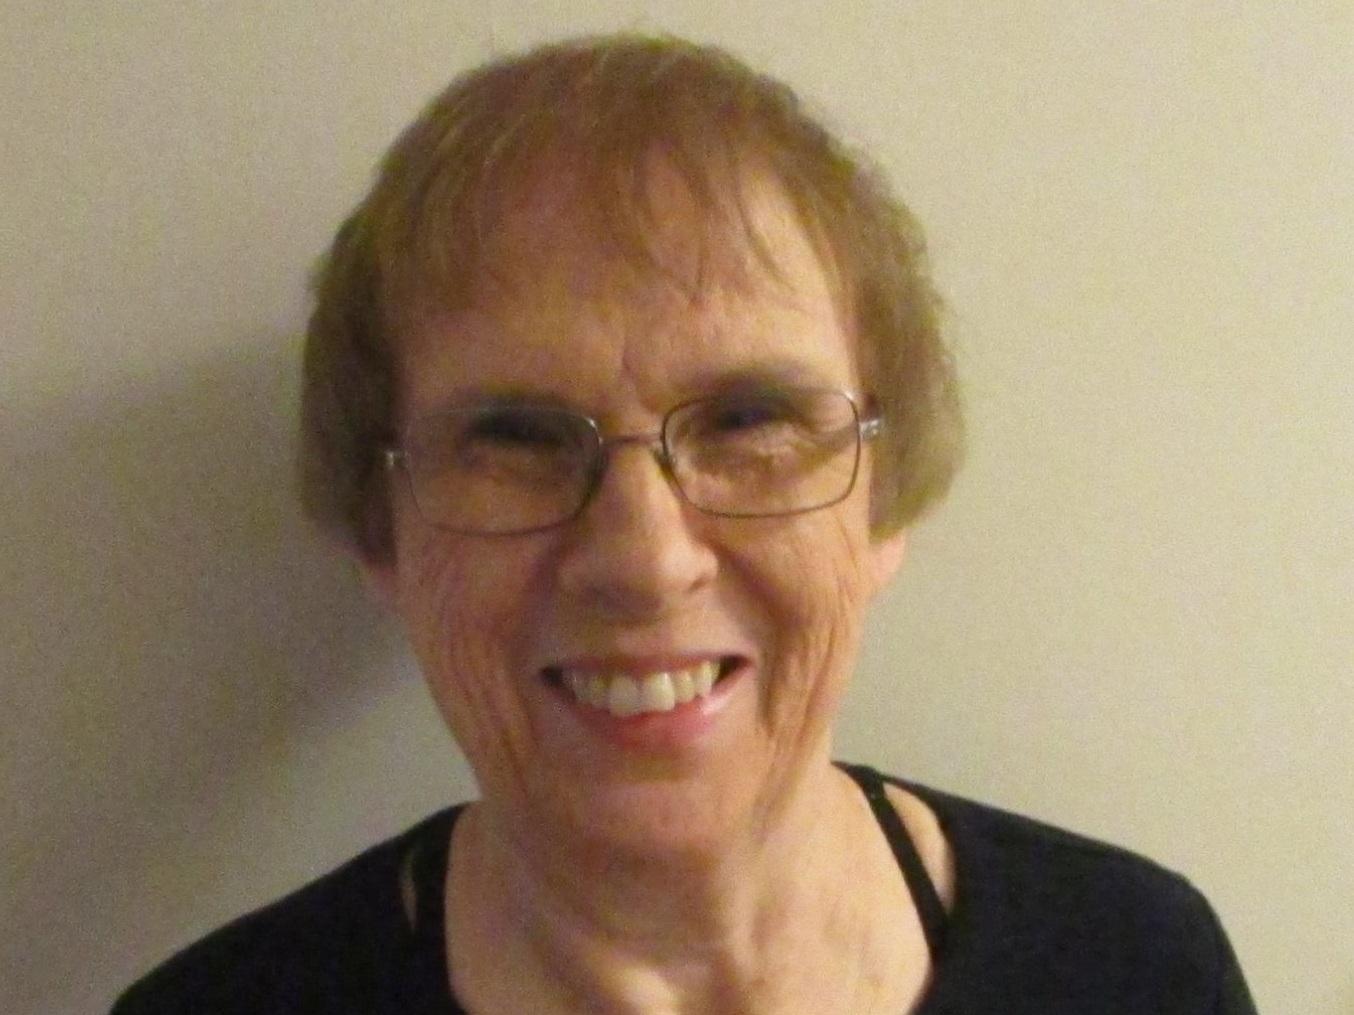 Season 1: Women in Alabama — The Pledge